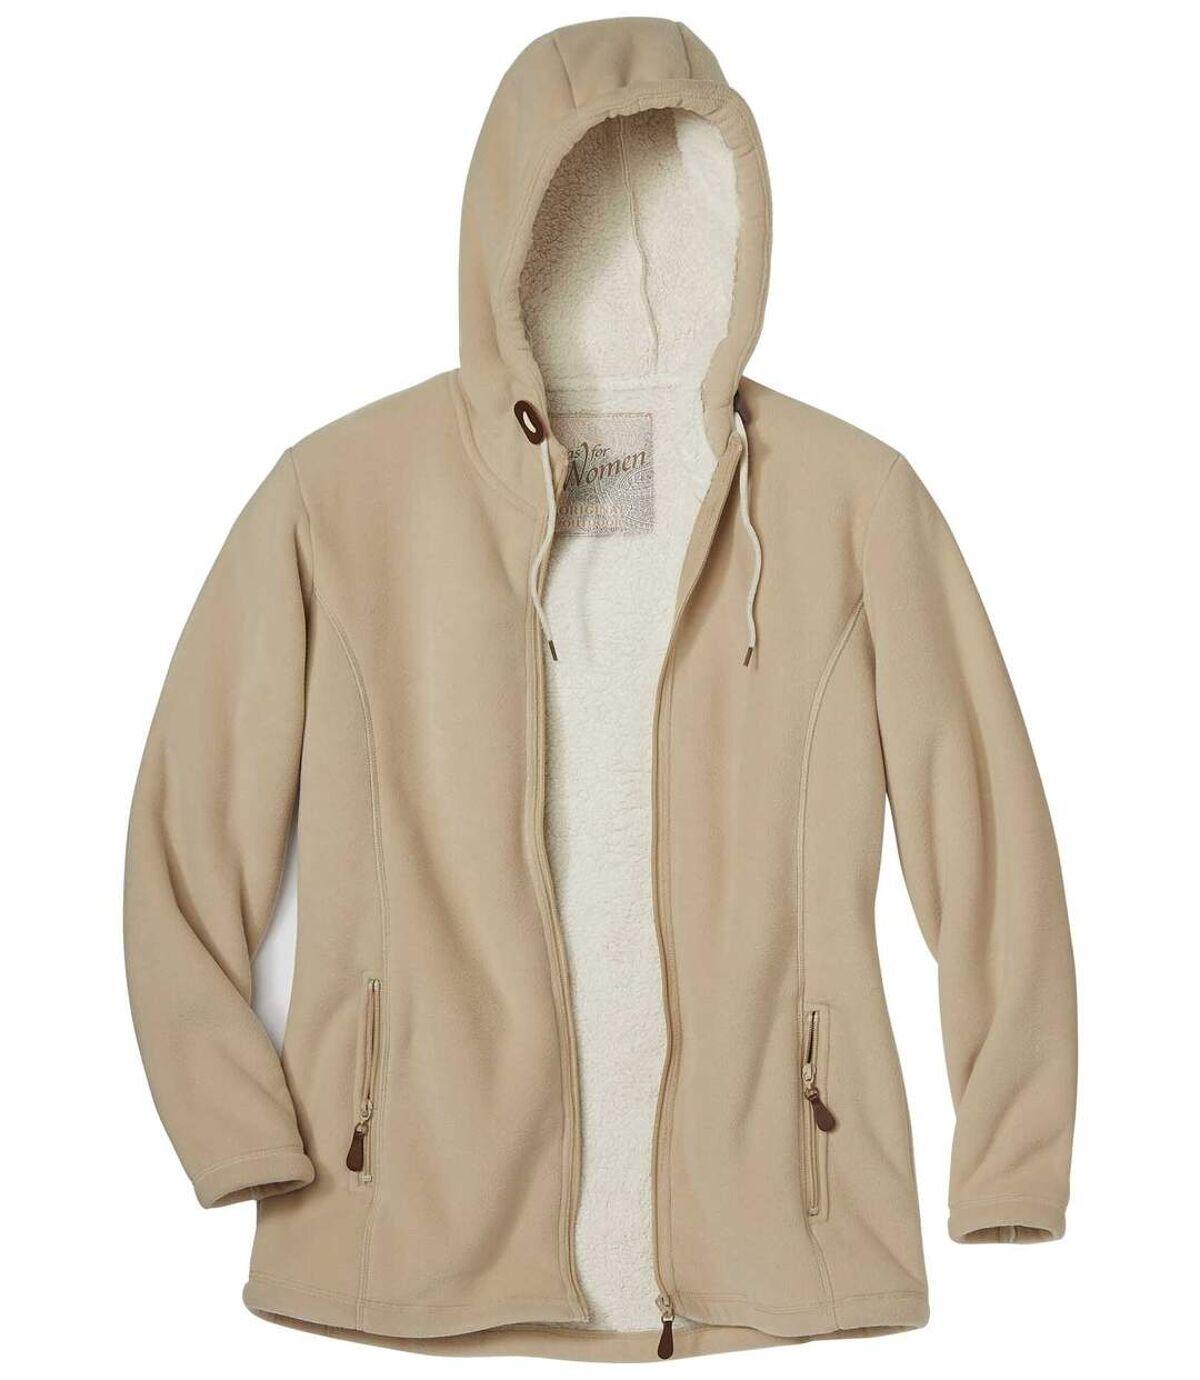 Women's Beige Jacket with Hood and Coral Fleece Lining Atlas For Men